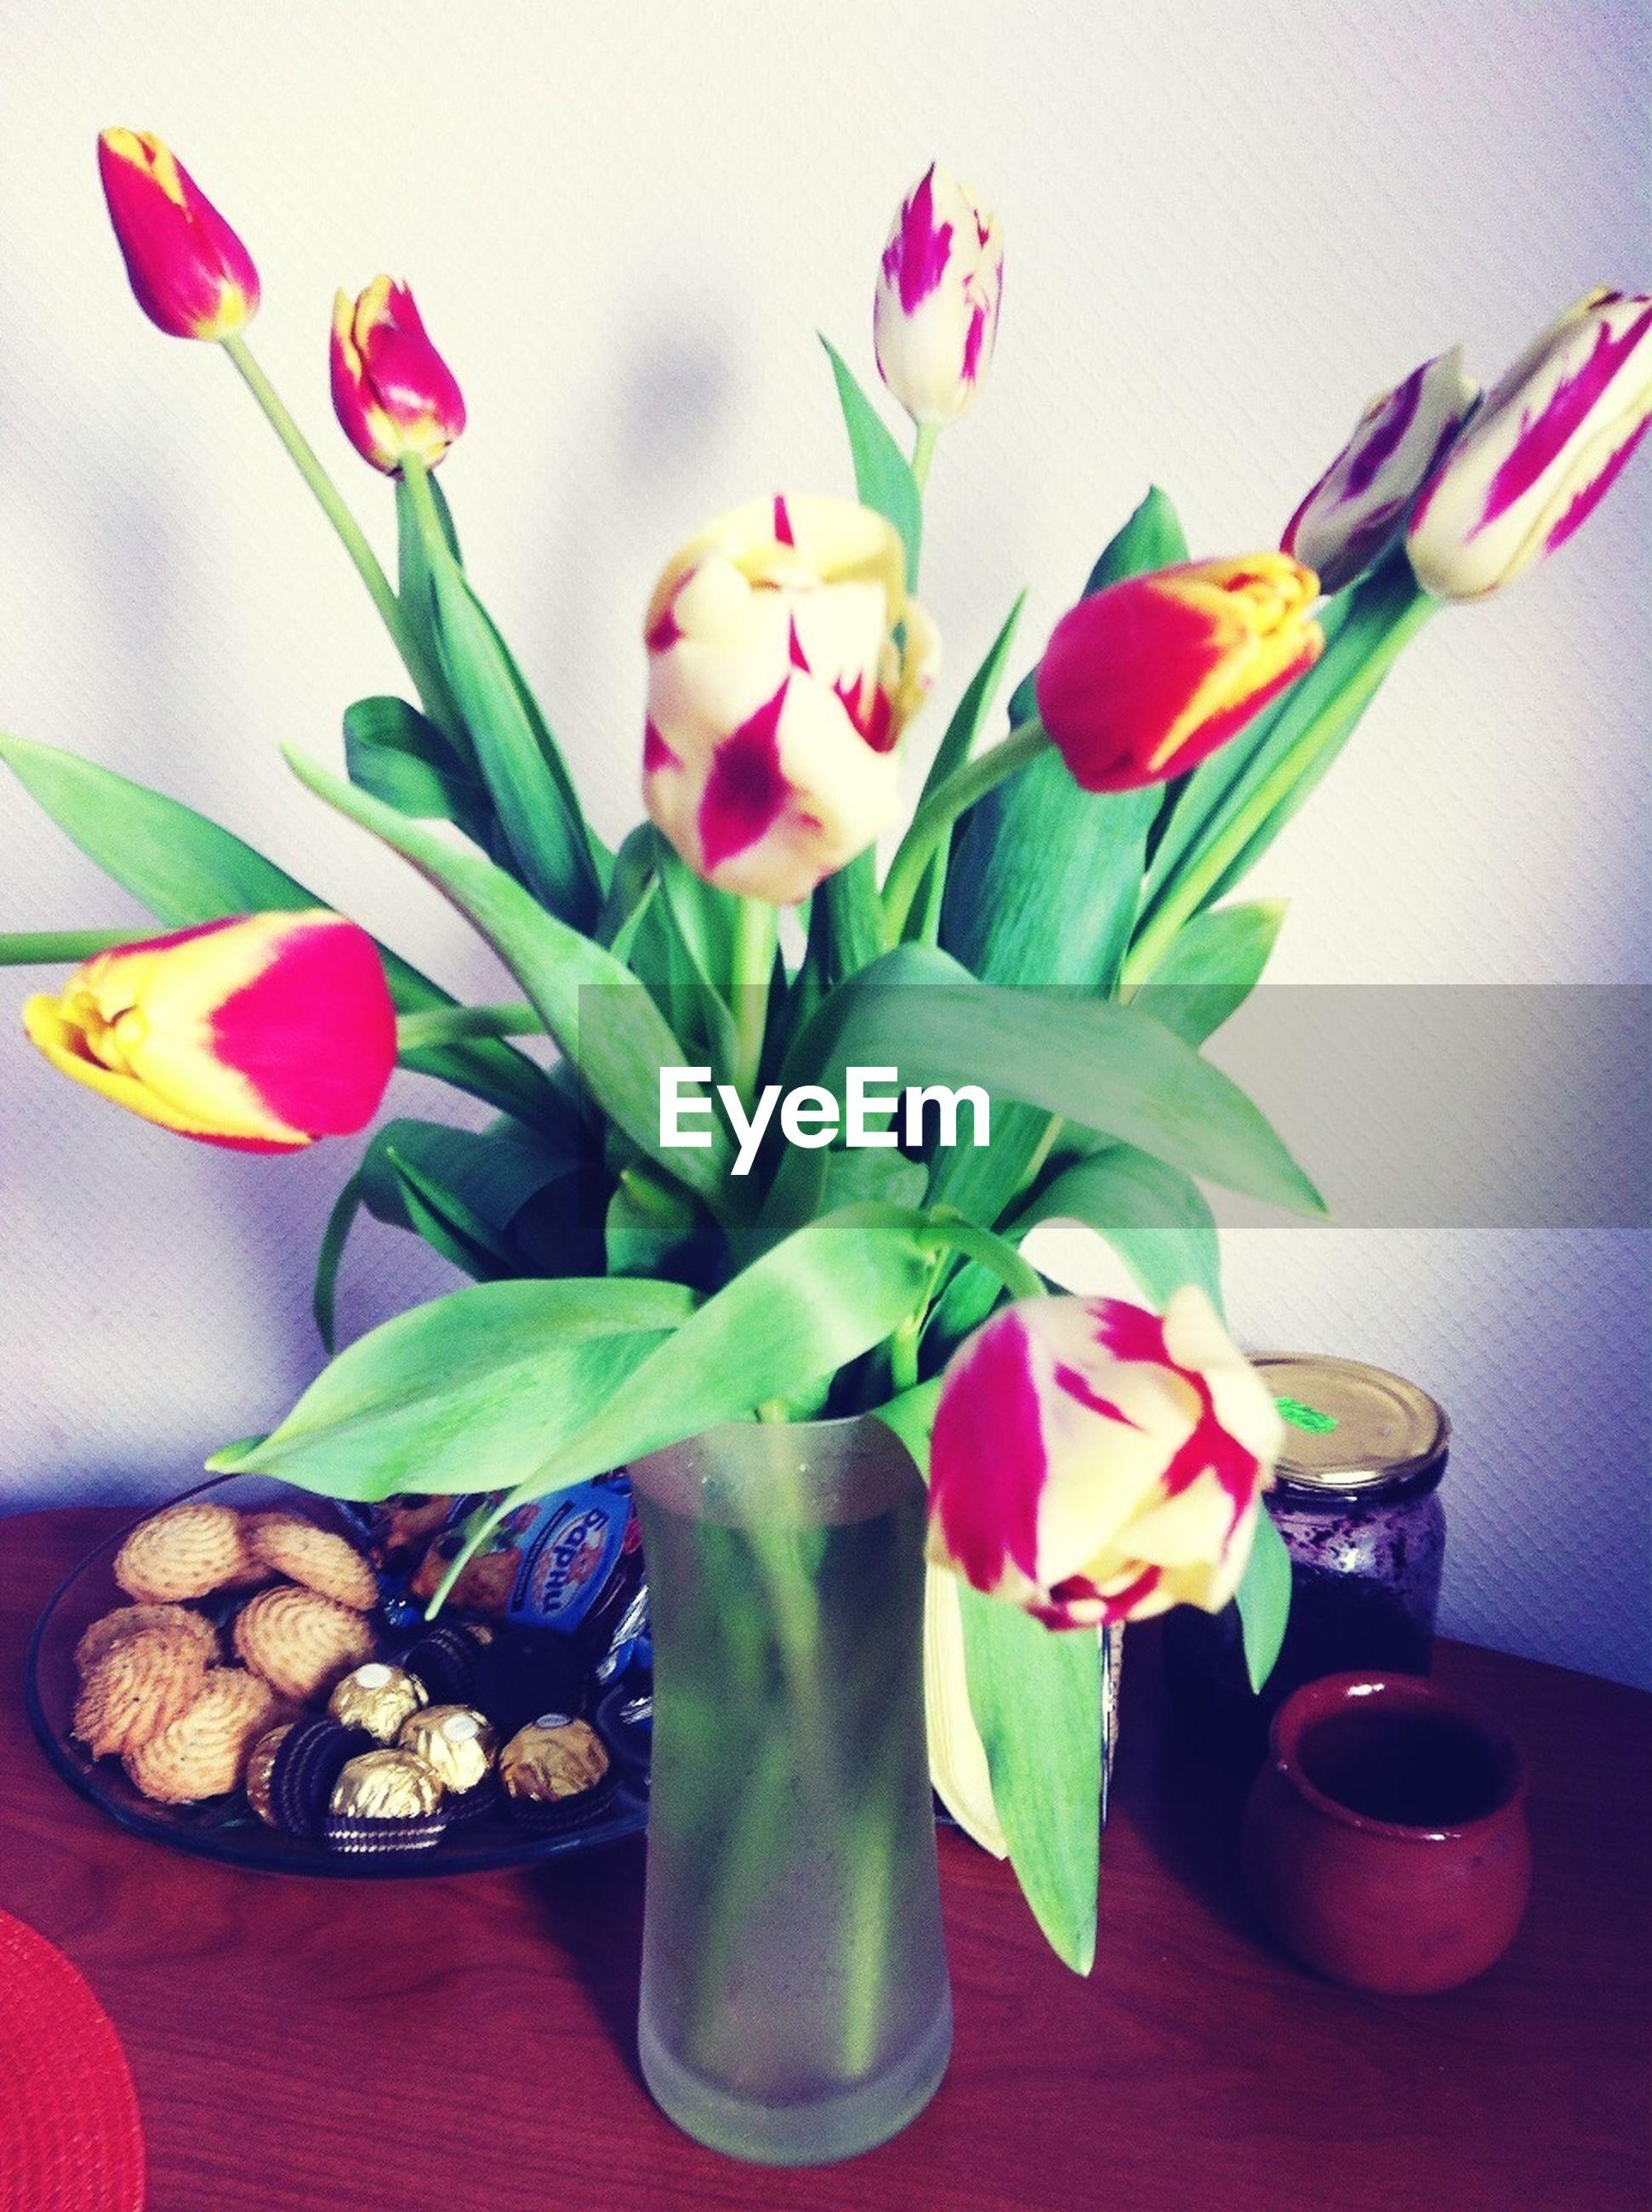 flower, indoors, vase, freshness, fragility, petal, table, flower head, decoration, close-up, flower arrangement, tulip, still life, home interior, pink color, potted plant, variation, stem, bouquet, bunch of flowers